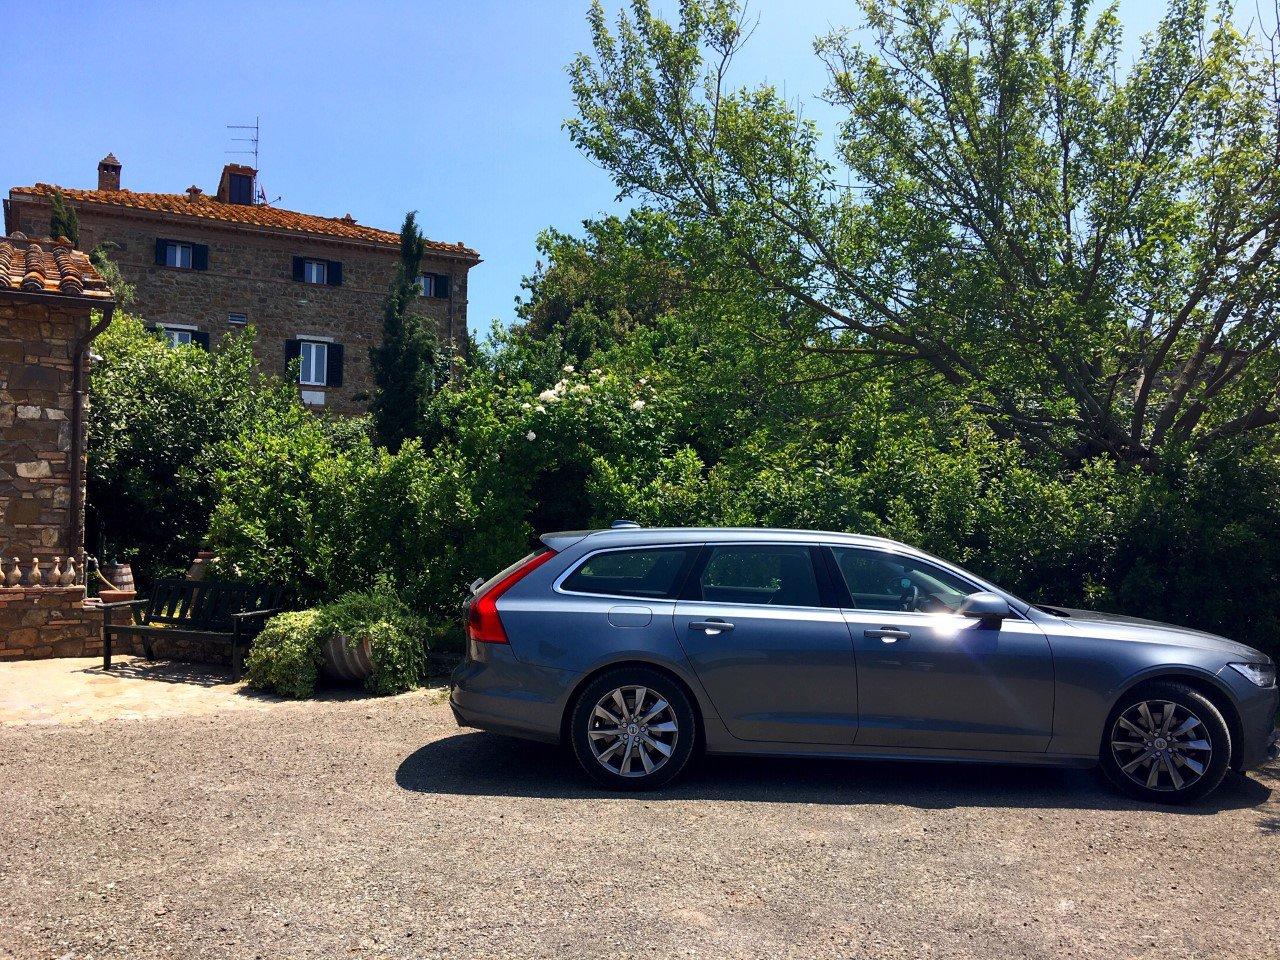 volvo station wagon tuscany